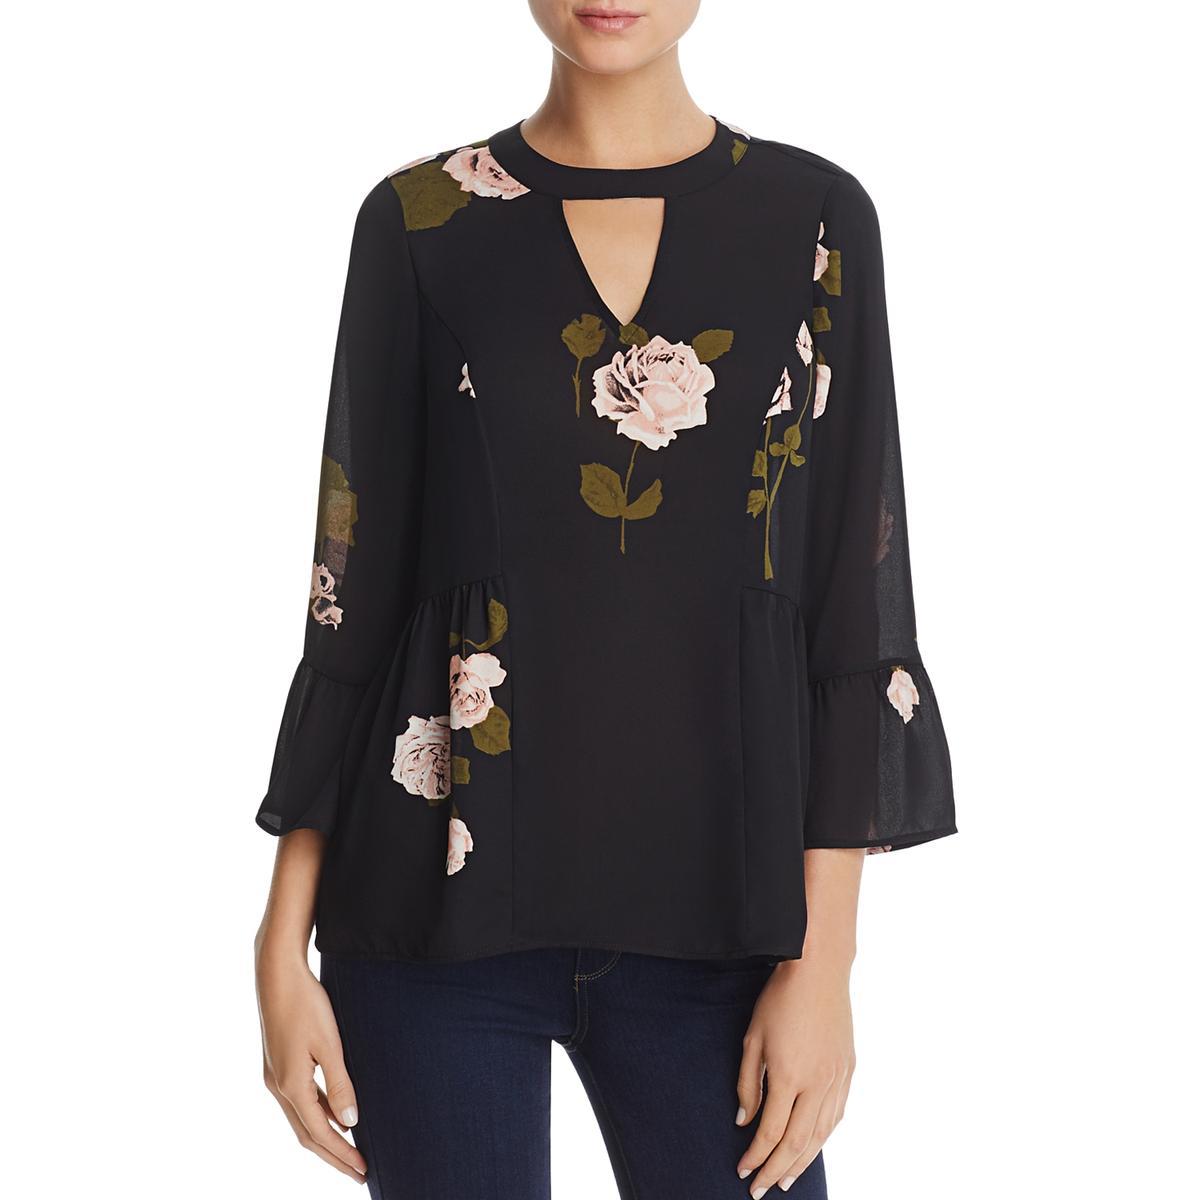 64ce24aeb77 Details about Daniel Rainn Womens Floral Print Bell Sleeves Peplum Top  Blouse BHFO 8058